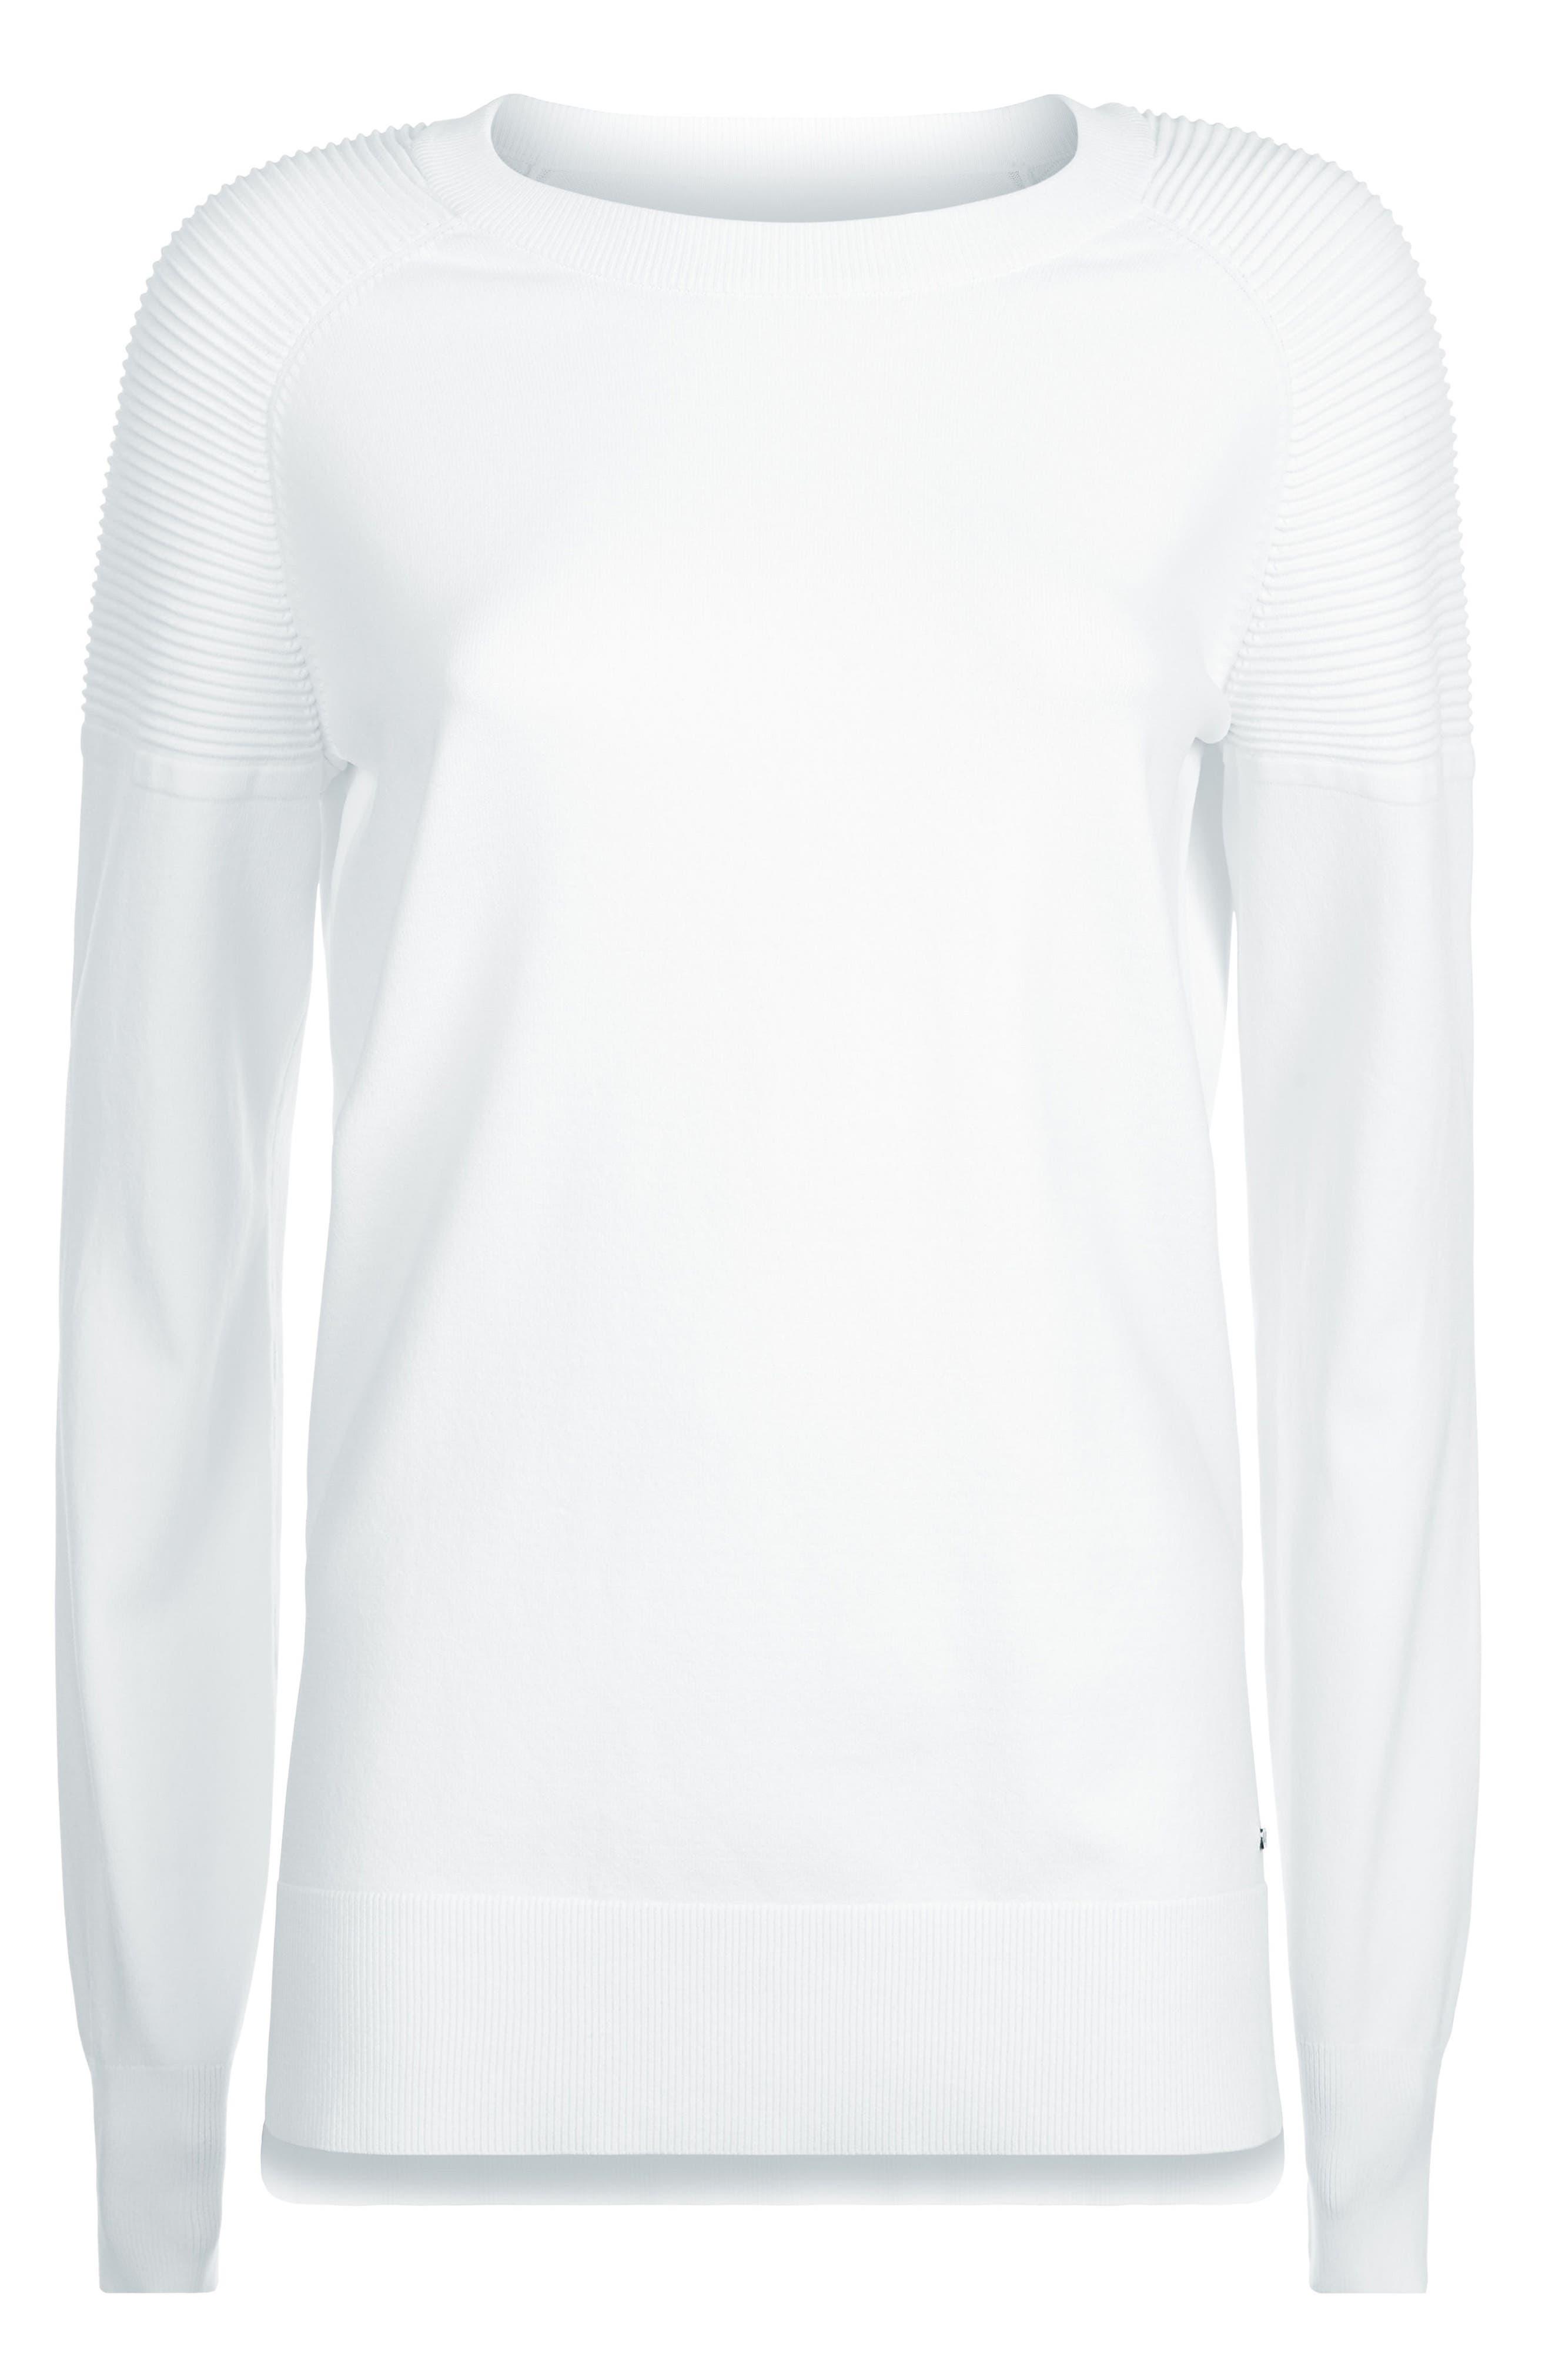 8 Track Sweatshirt,                             Alternate thumbnail 6, color,                             White